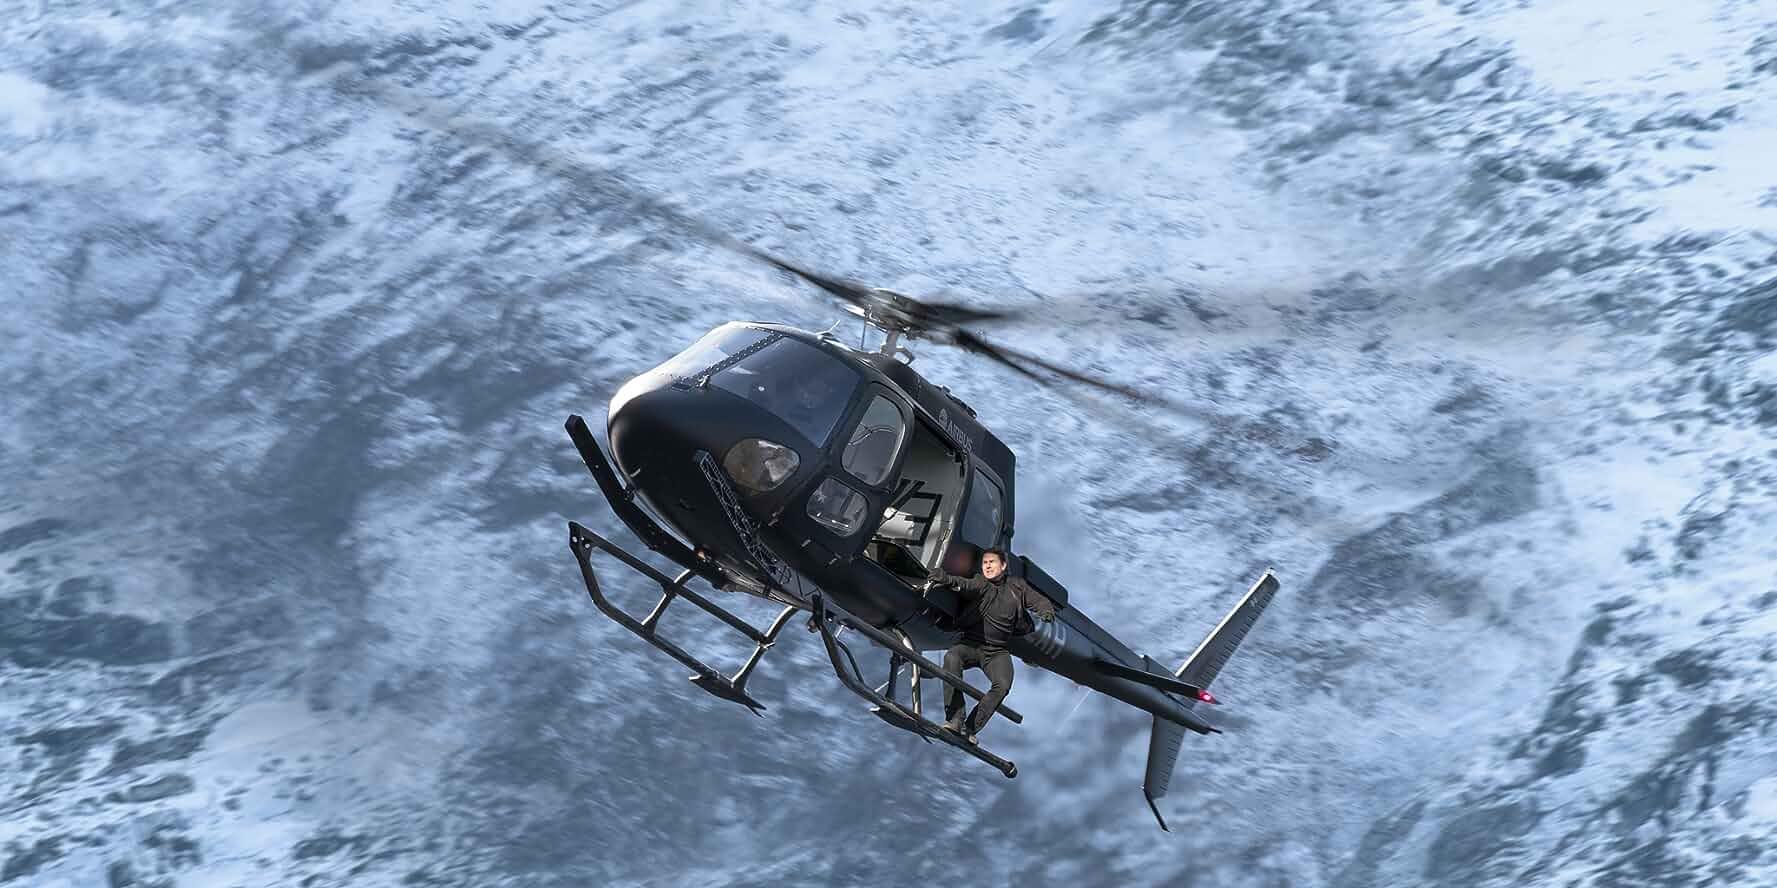 Watch Mission: Impossible - Fallout (2018) Full Movie Online on Youtube, Dailymotion, Putlocker, Cloudy, Vodlocker, Videoweed, Novamov, Nowvideo, Putlocker